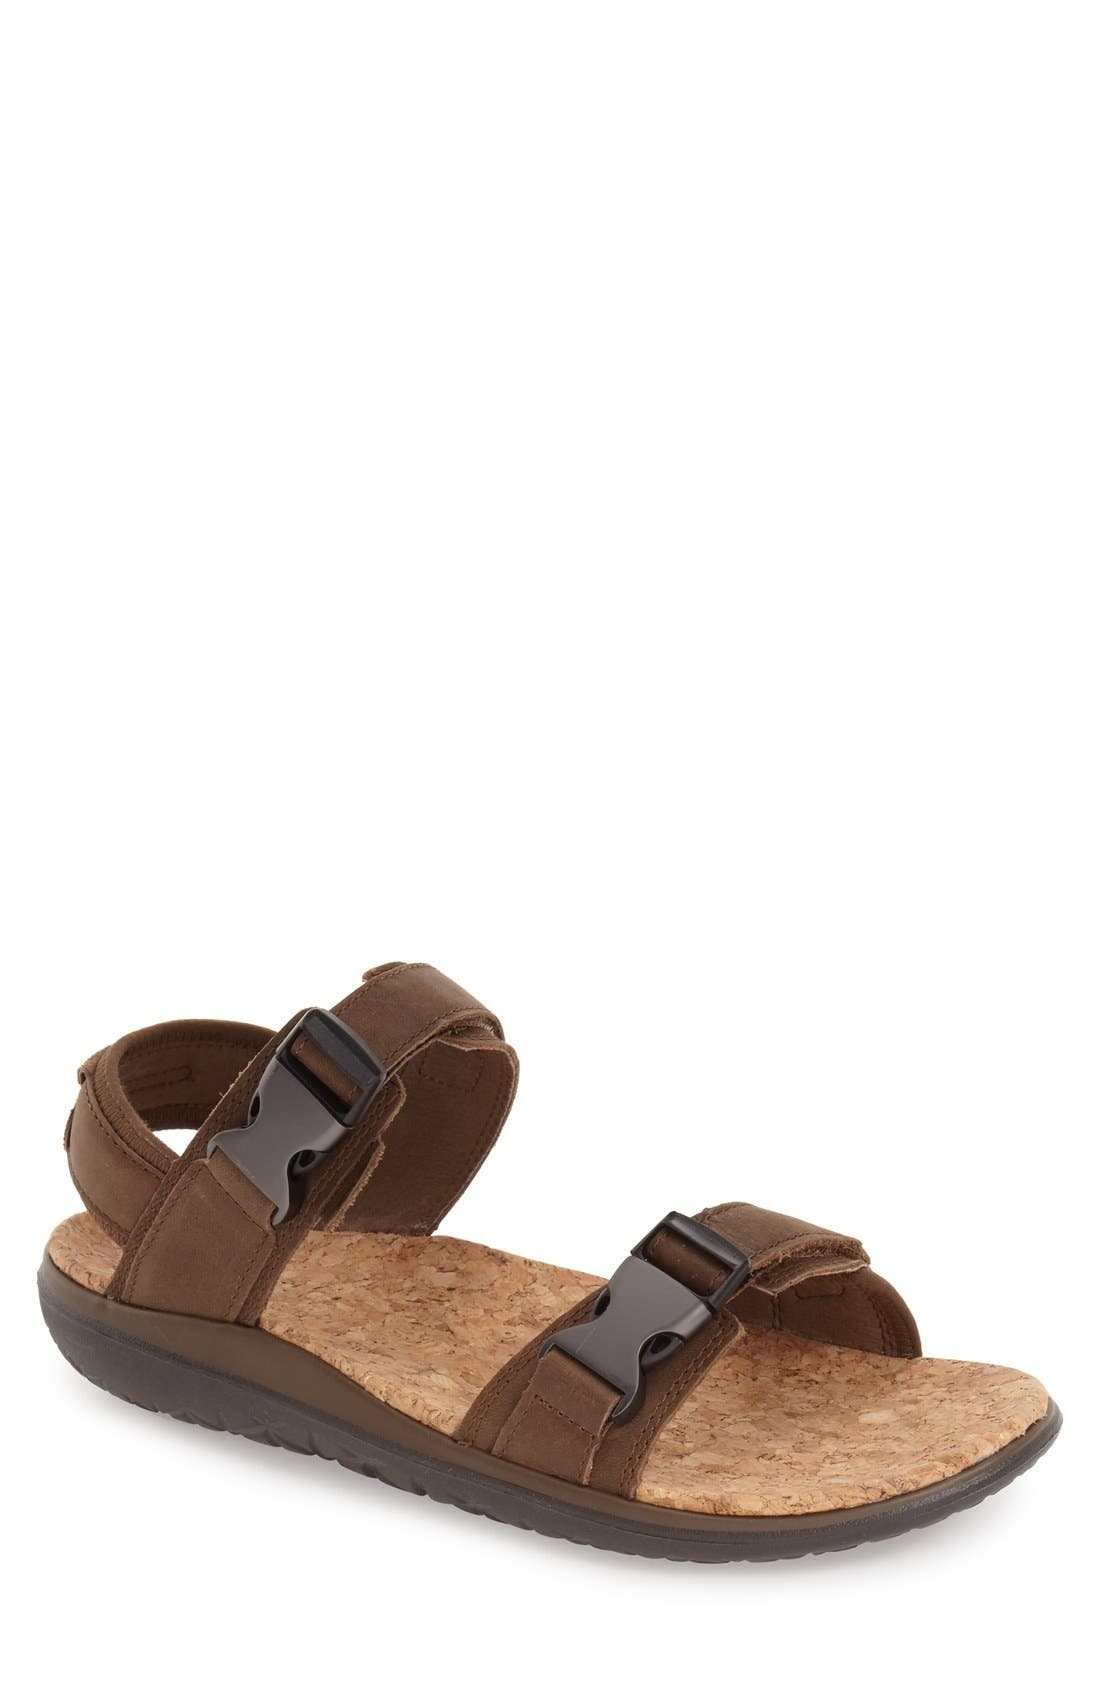 Alternate Image 1 Selected - Teva 'Terra-Float Universal Lux' Sport Sandal (Men)